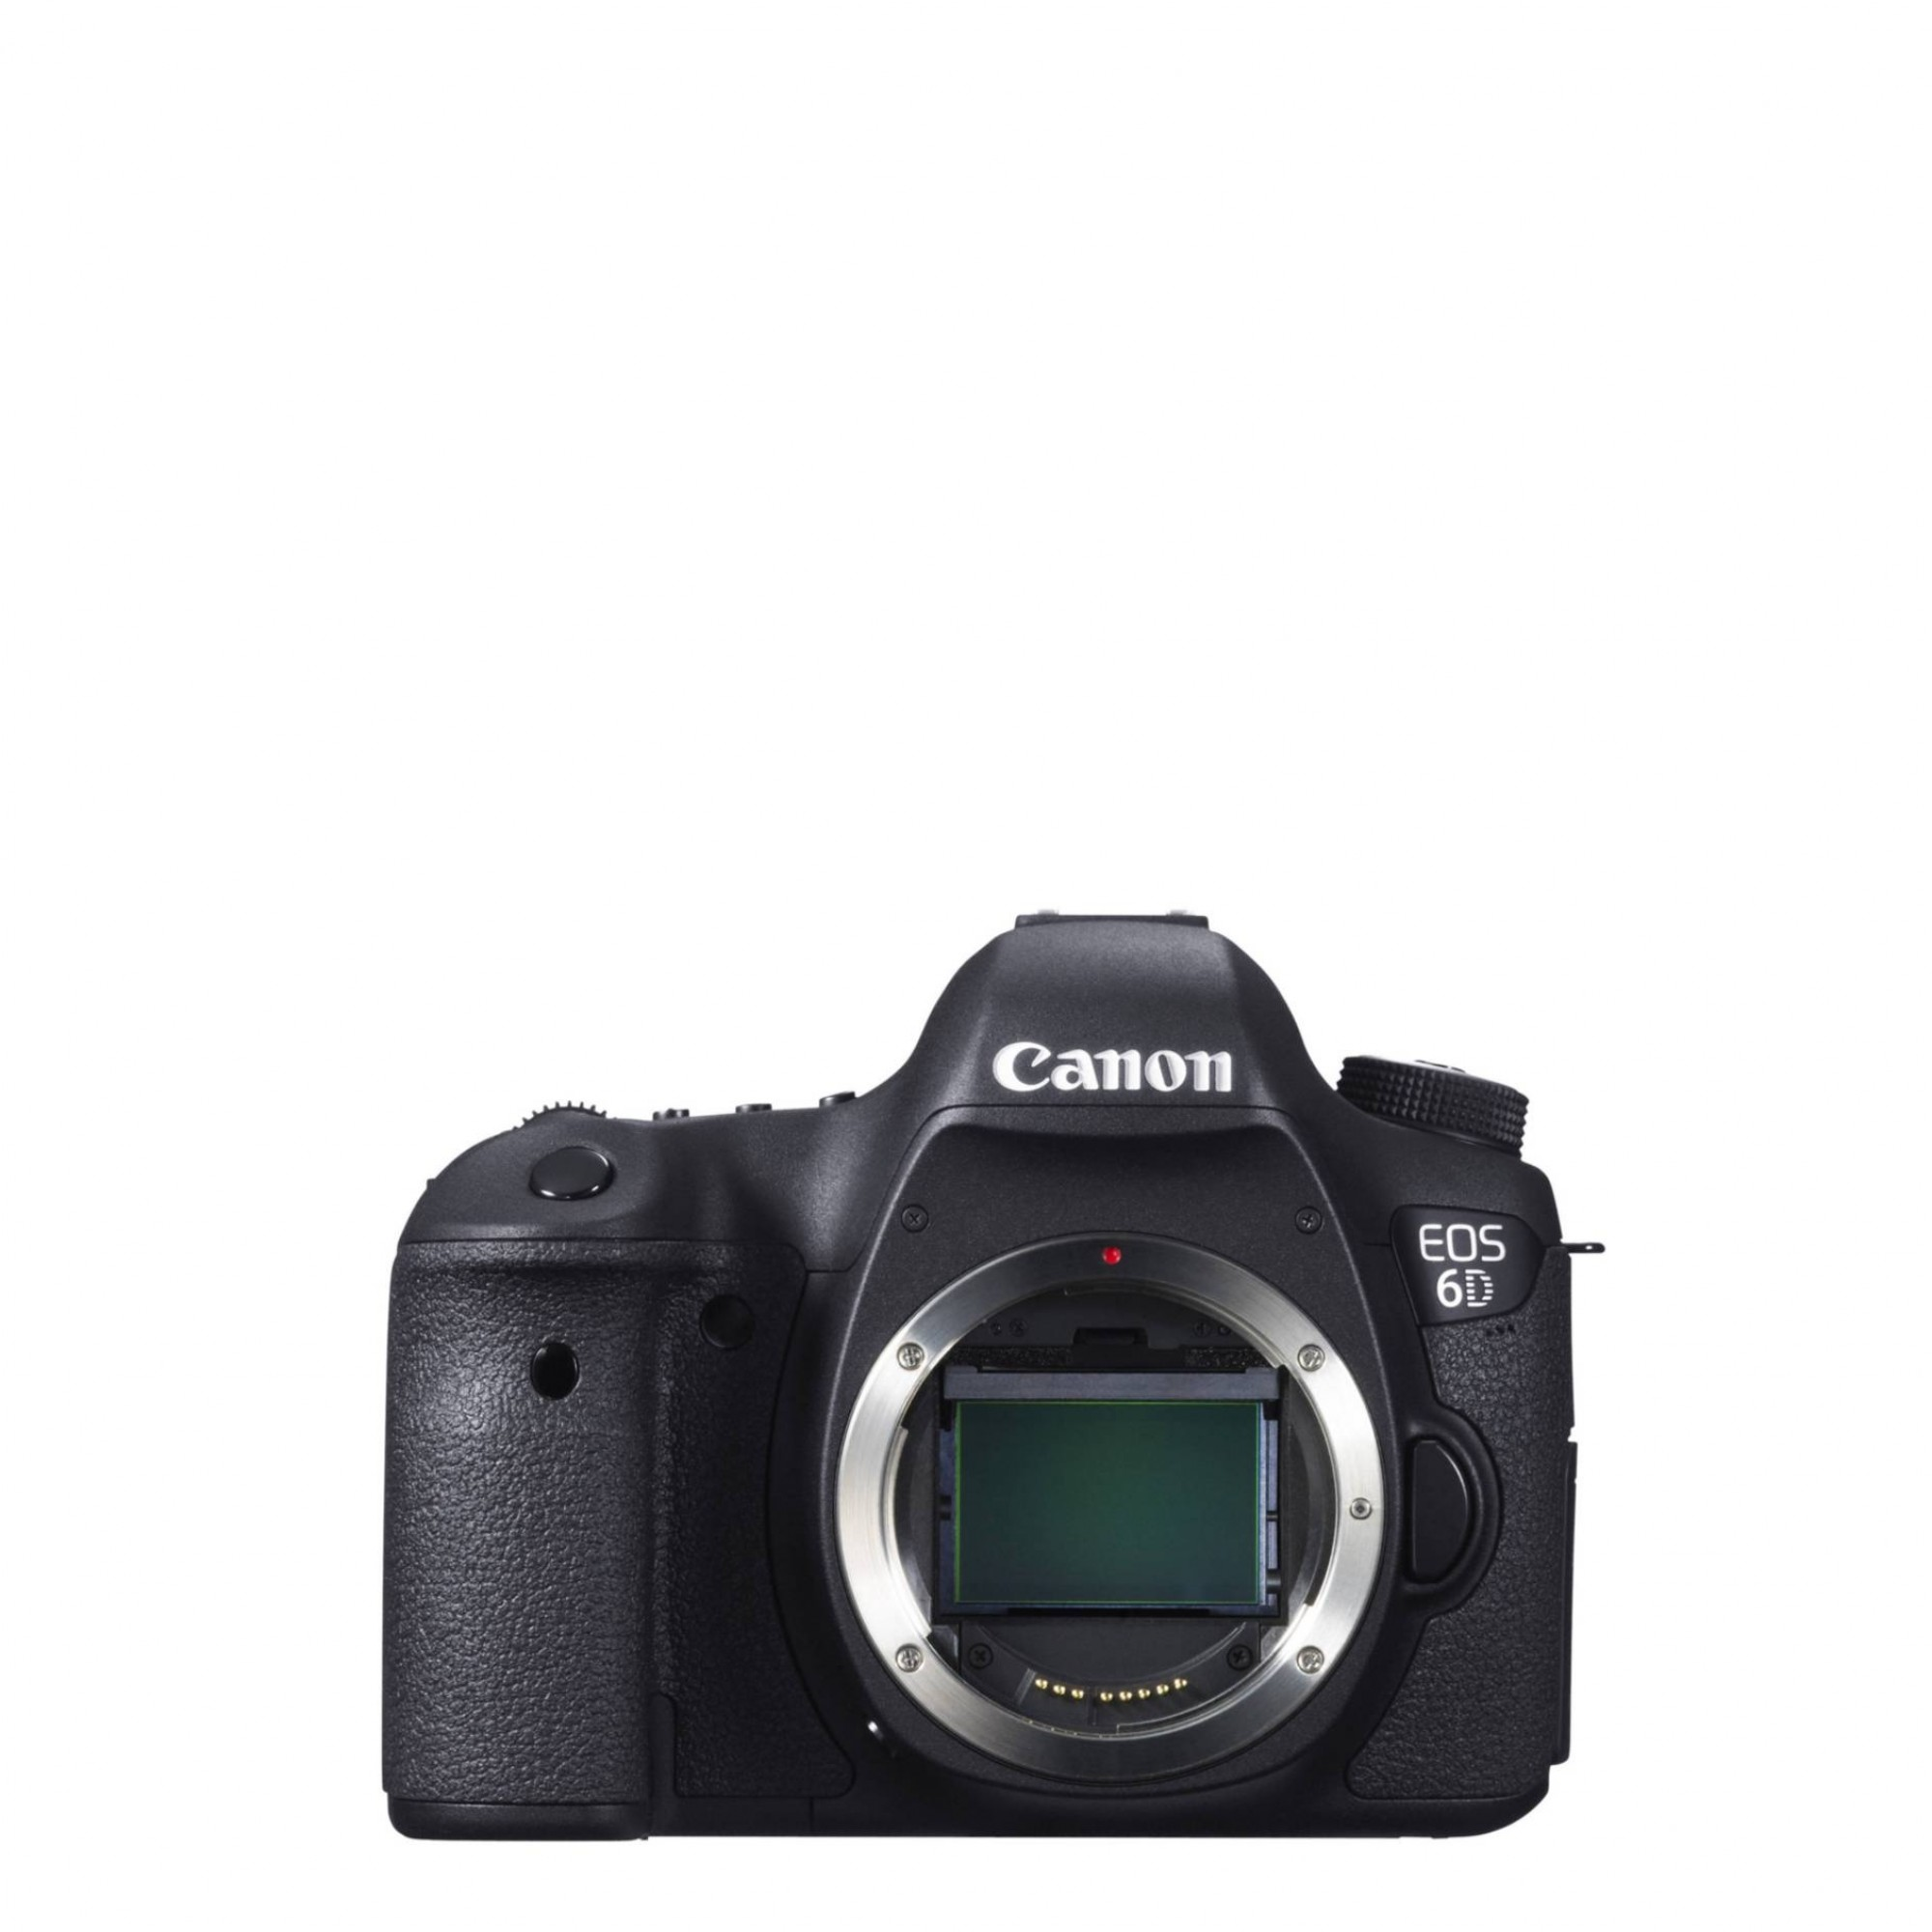 AltraOtticaStore.it - Noleggio Canon EOS 6D (Fotocamere) - Noleggio ...